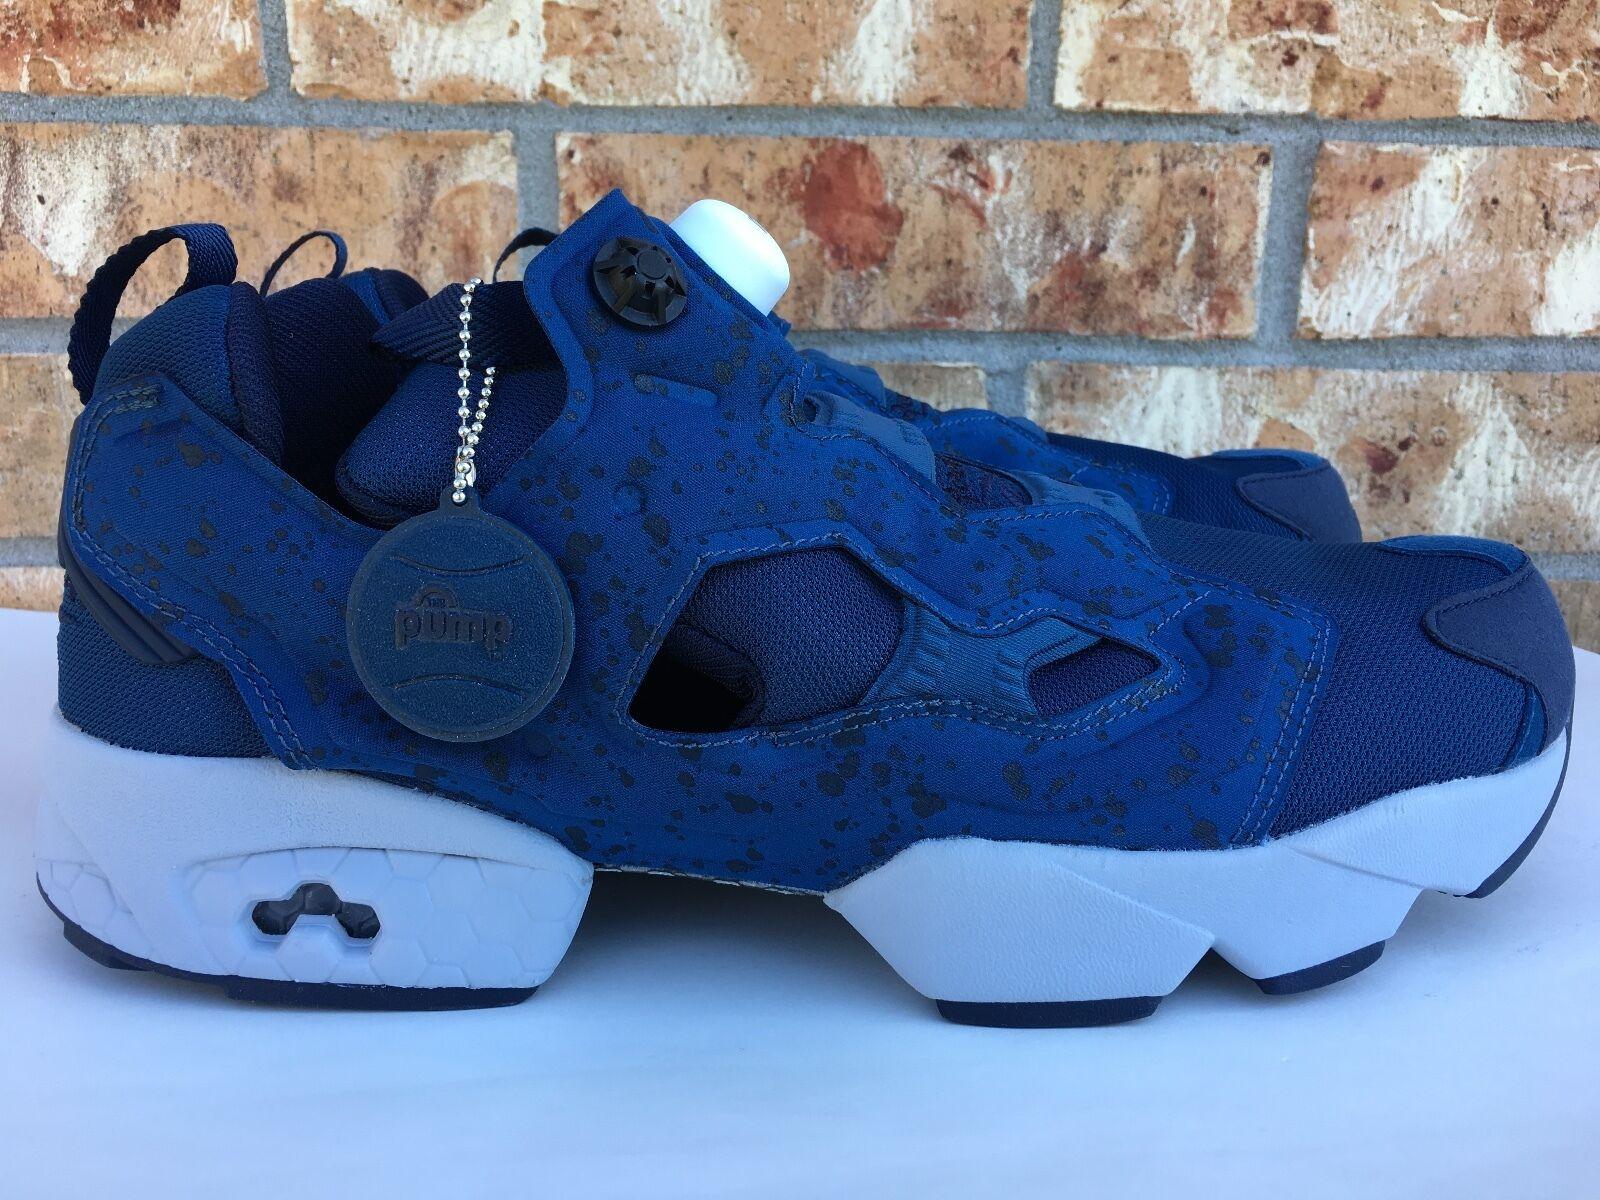 Men's Reebok Insta Pump Fury SP Noble bluee Grey Casual shoes Sneakers AQ9800